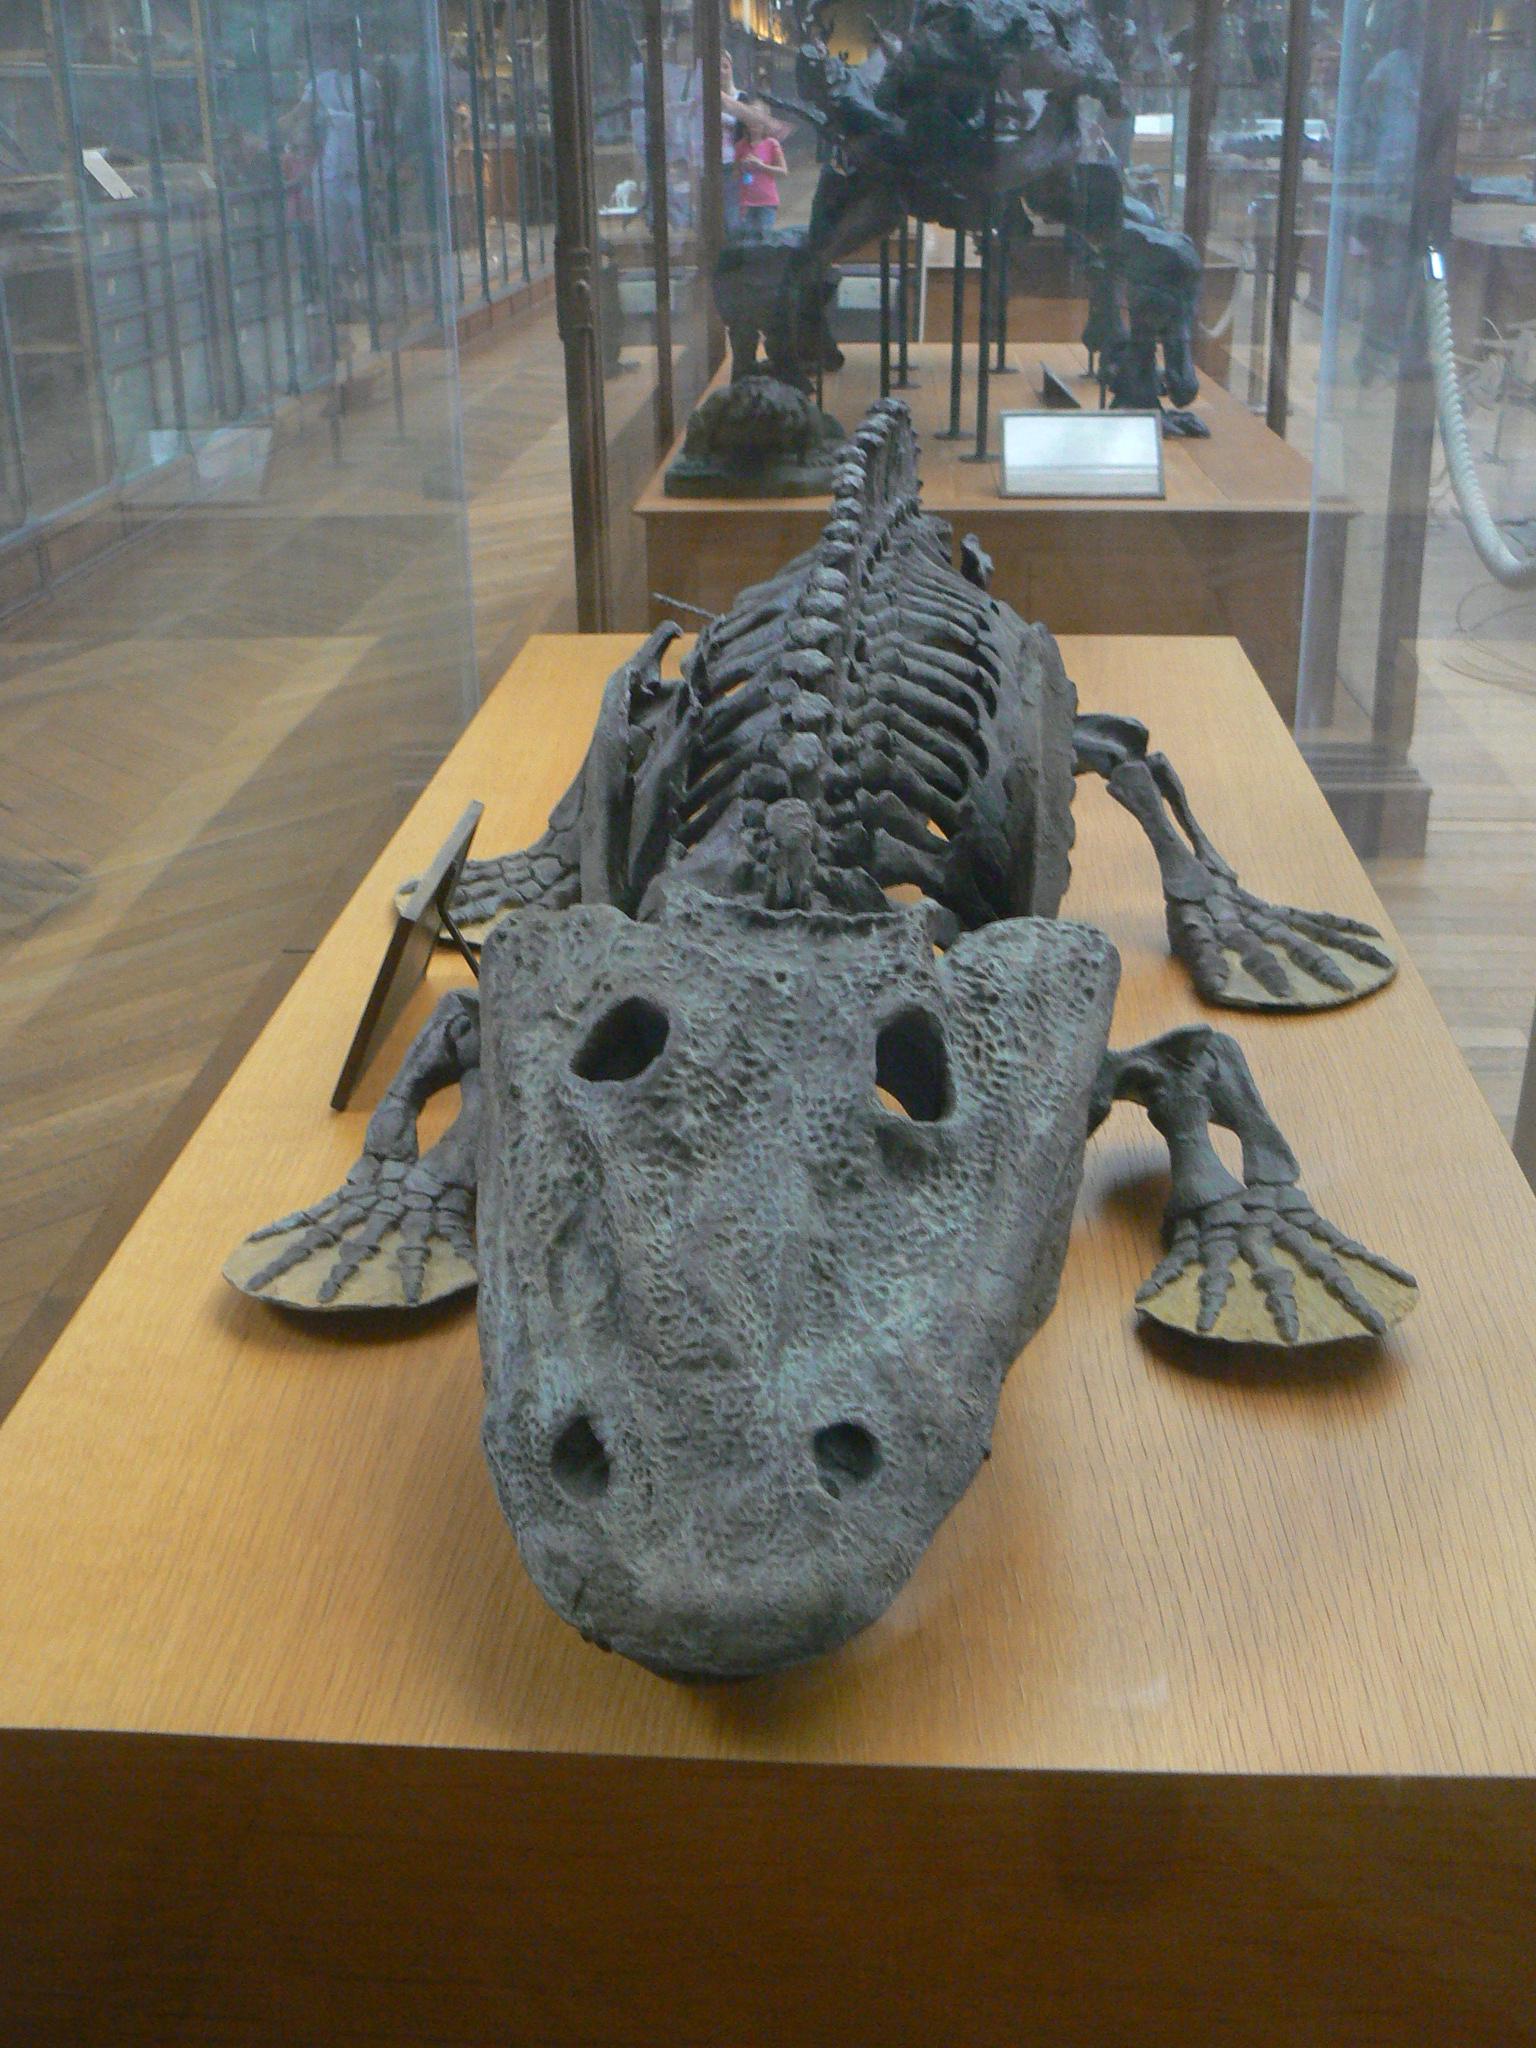 http://upload.wikimedia.org/wikipedia/commons/a/aa/Eryops_megacephalus_skeleton_front.JPG